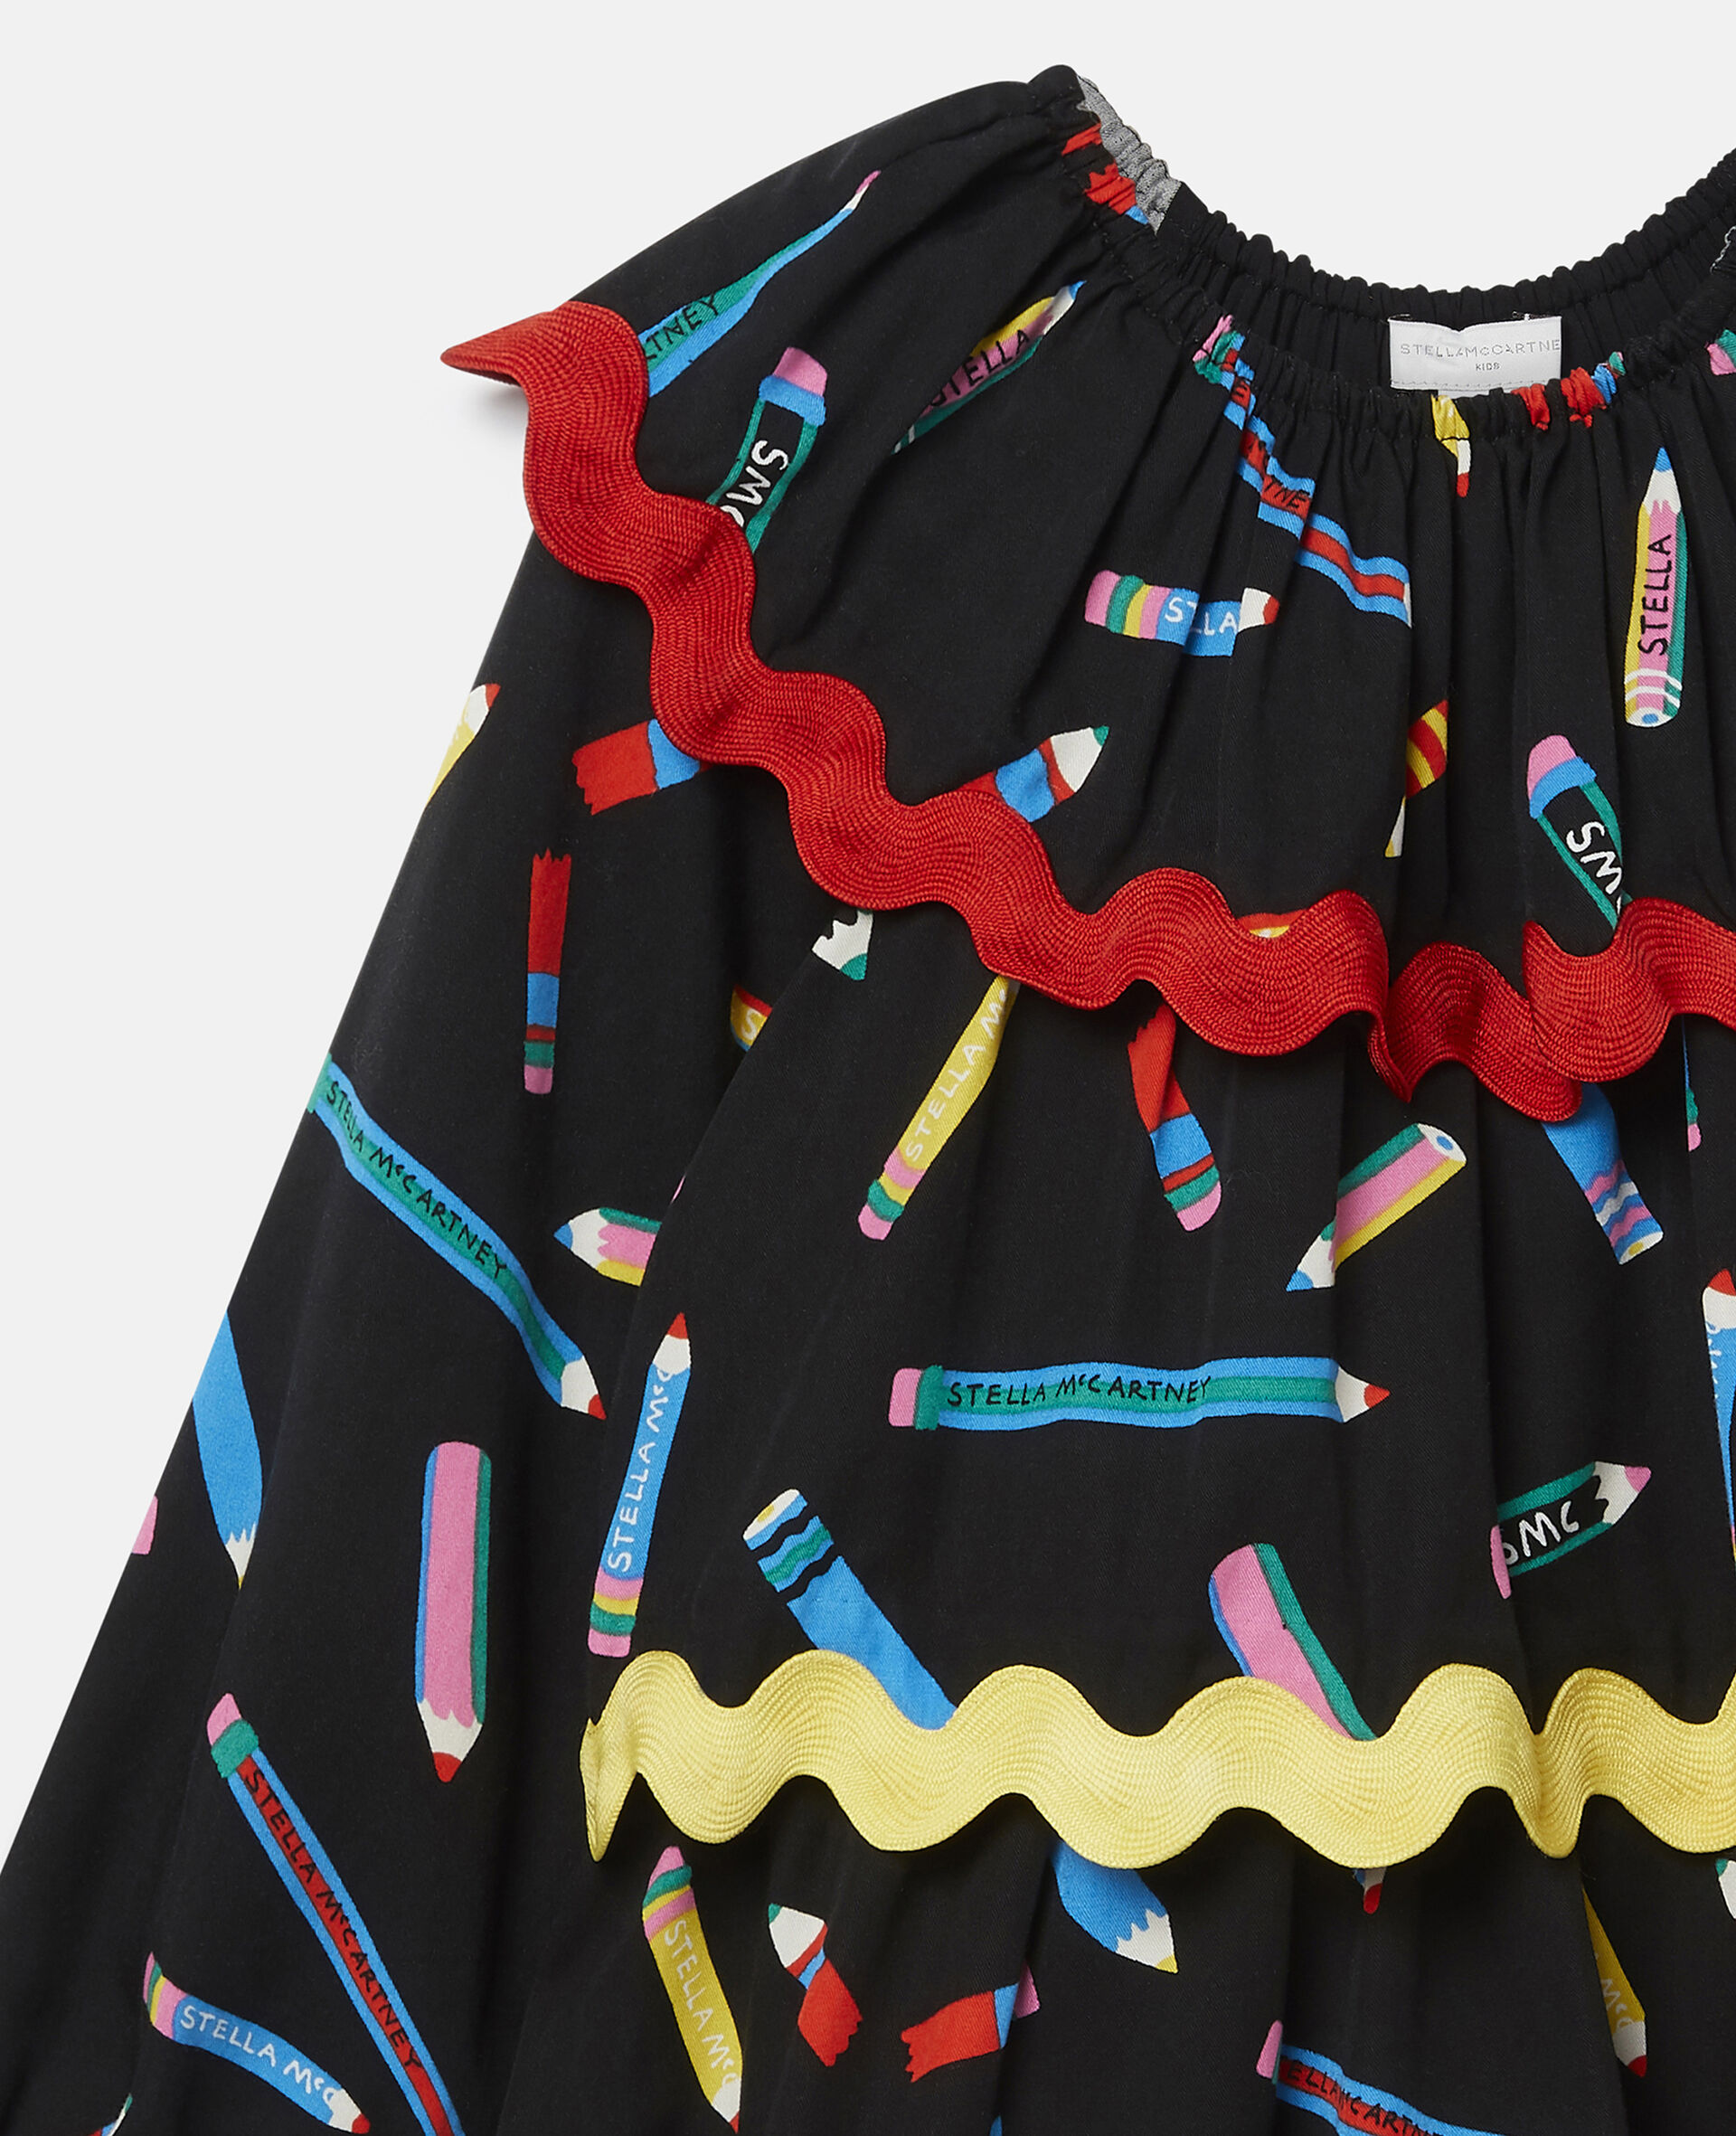 铅笔印花分层斜纹布连衣裙 -黑色-large image number 2